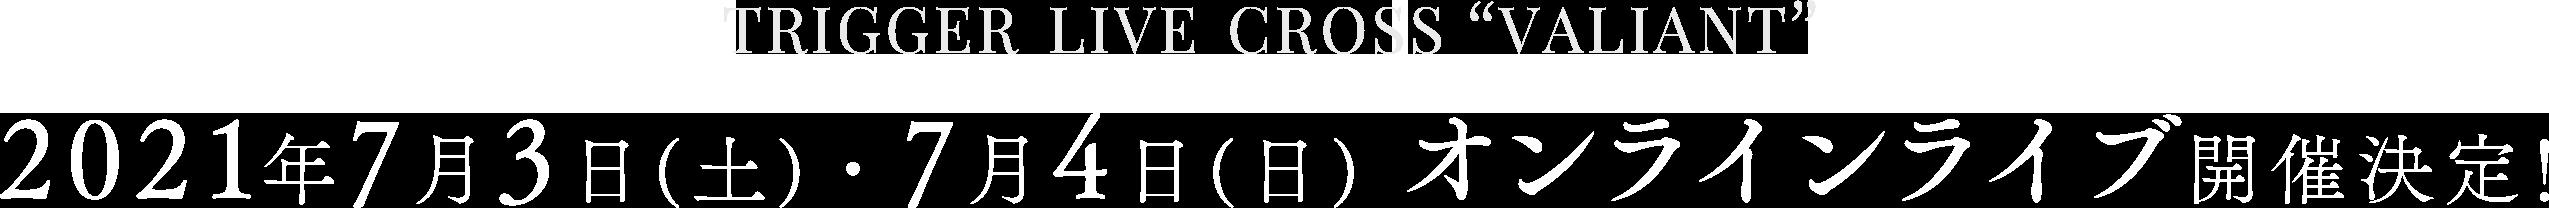 "TRIGGER LIVE CROSS ""VALIANT"""